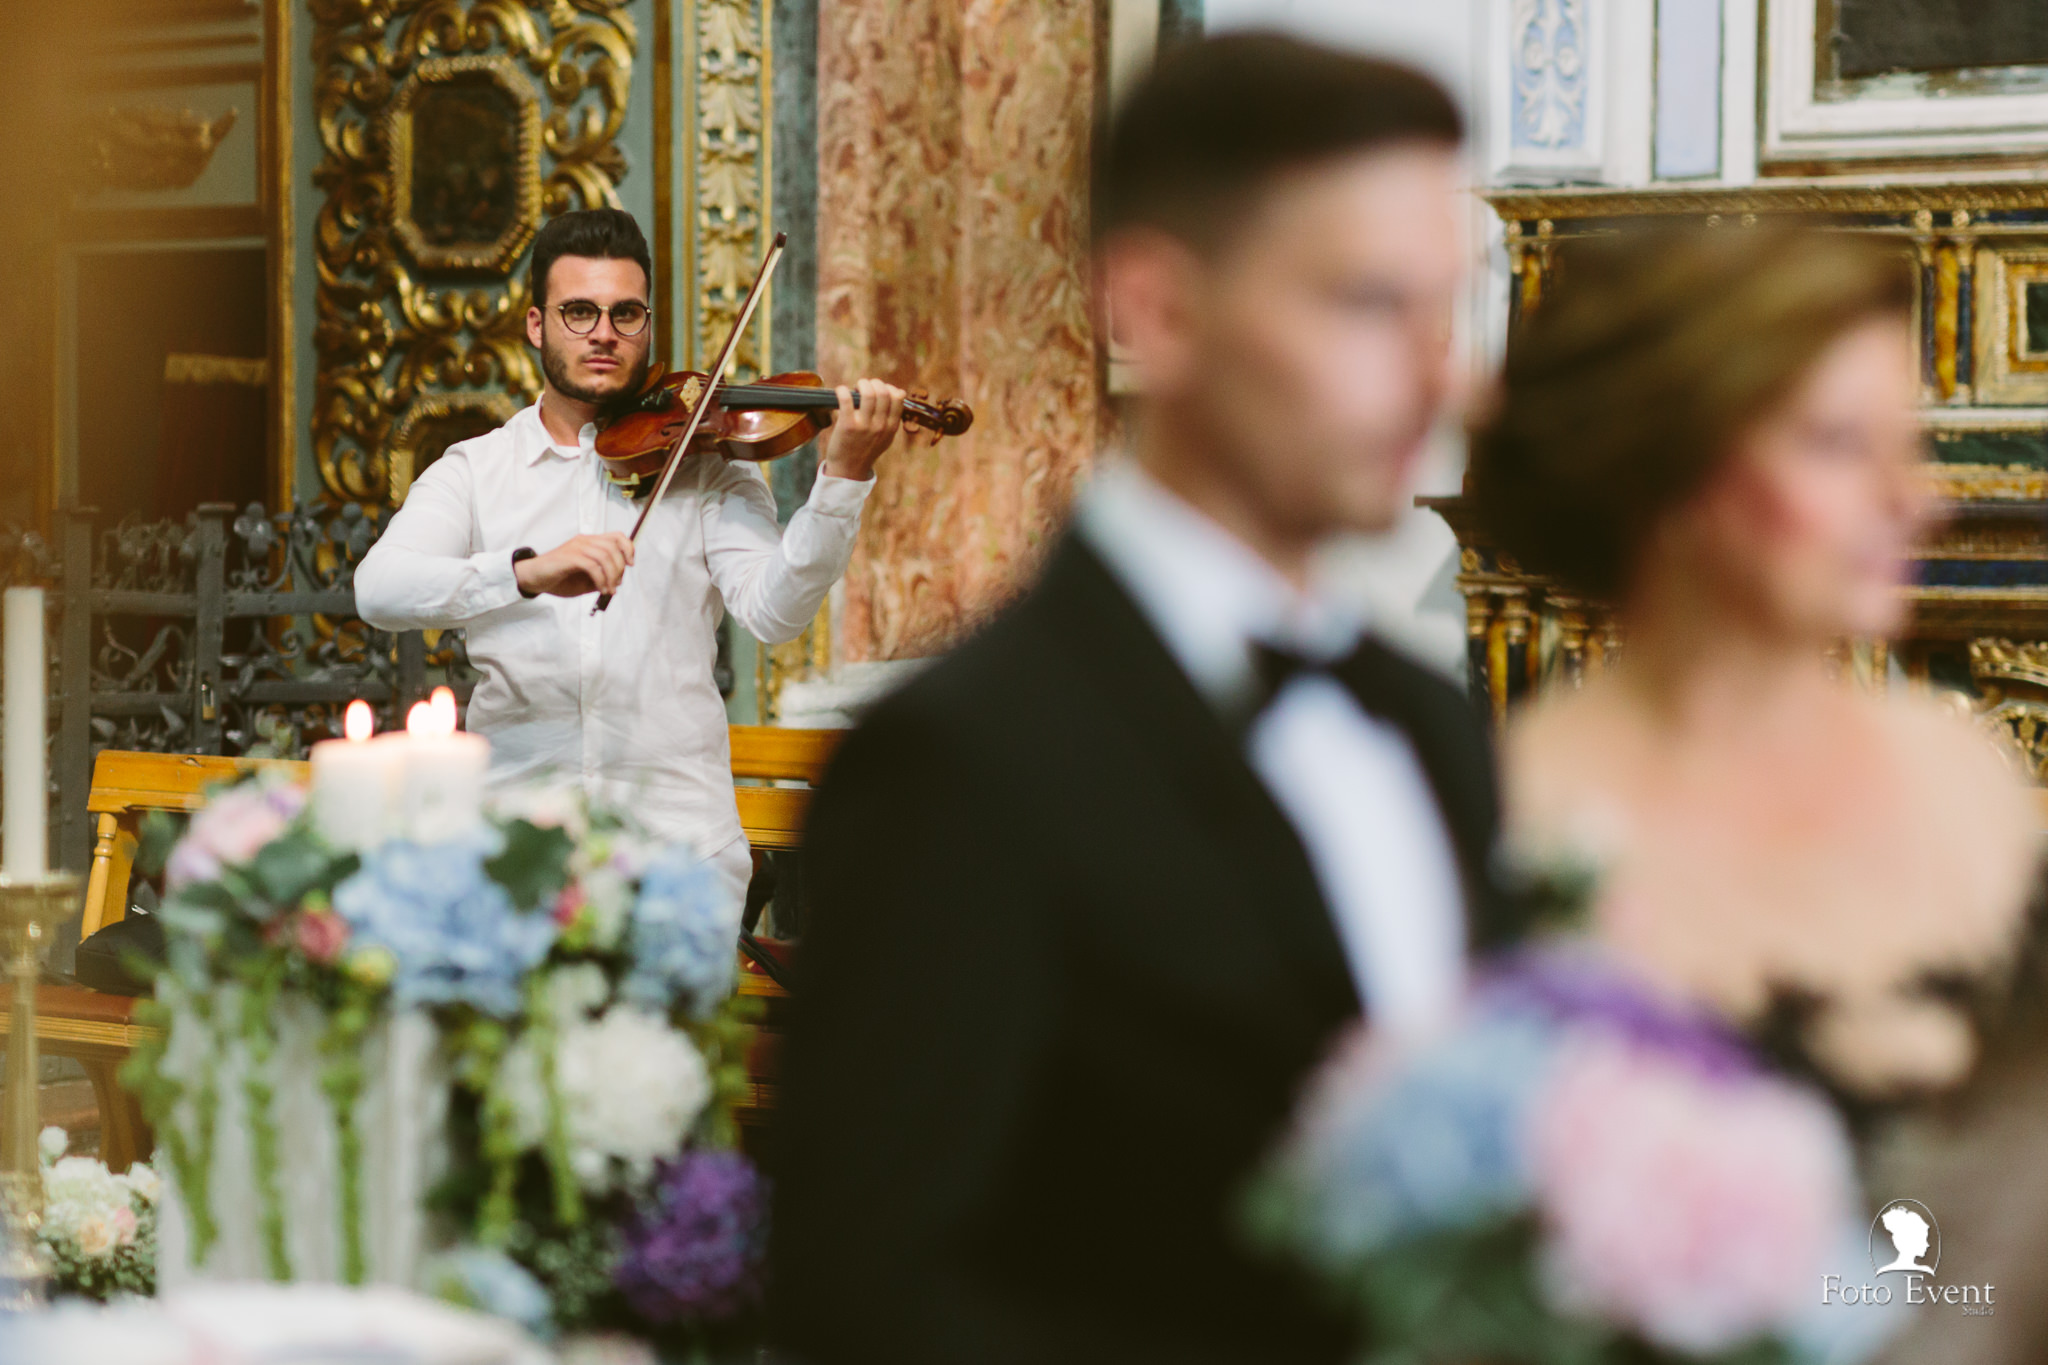 035-2019-08-22-Matrimonio-Angela-e-Nicola-Iaconis-Ric1-180